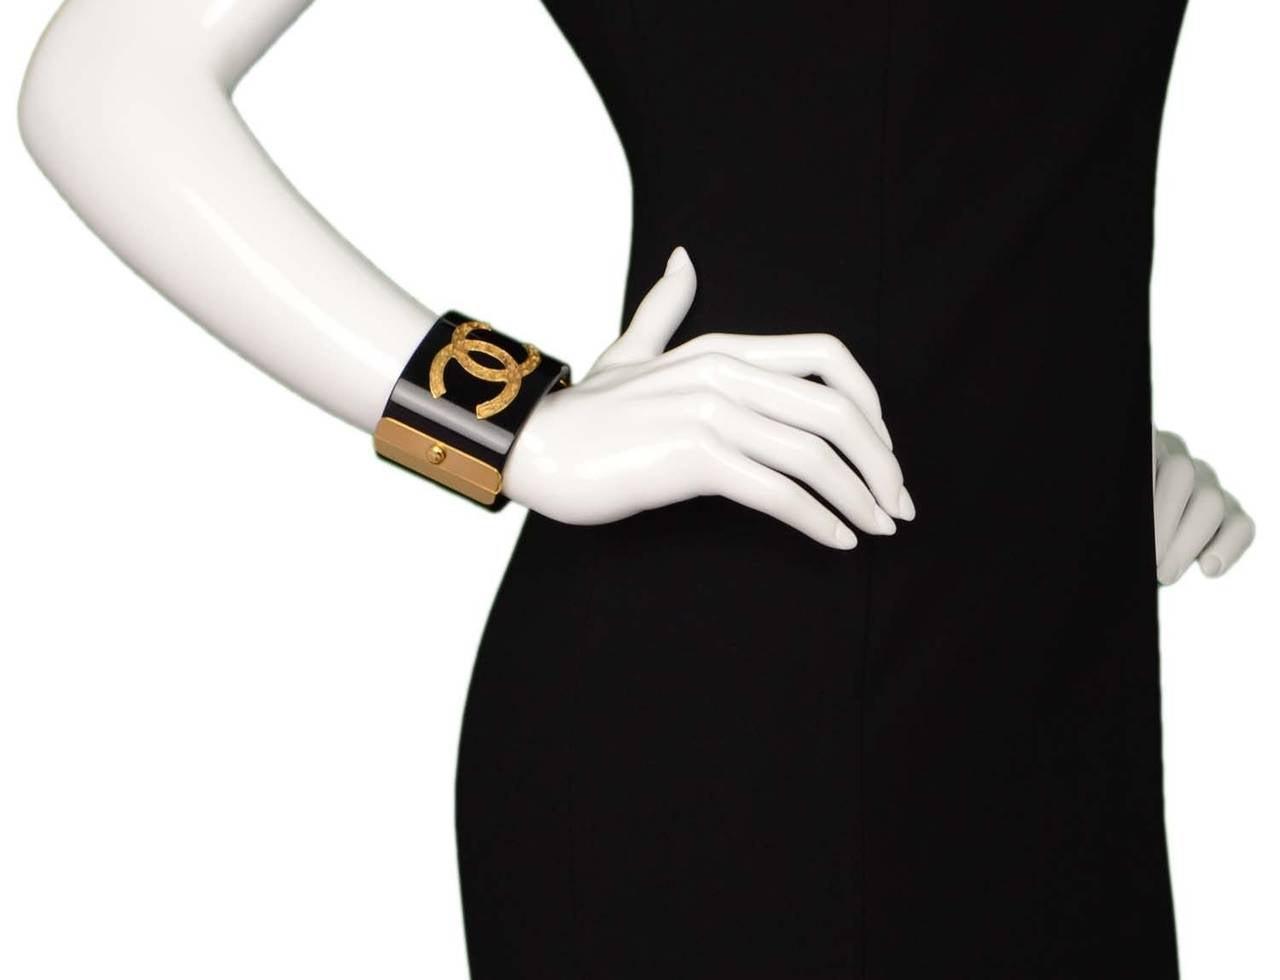 CHANEL Black Resin & Goldtone Cuff Bracelet 7